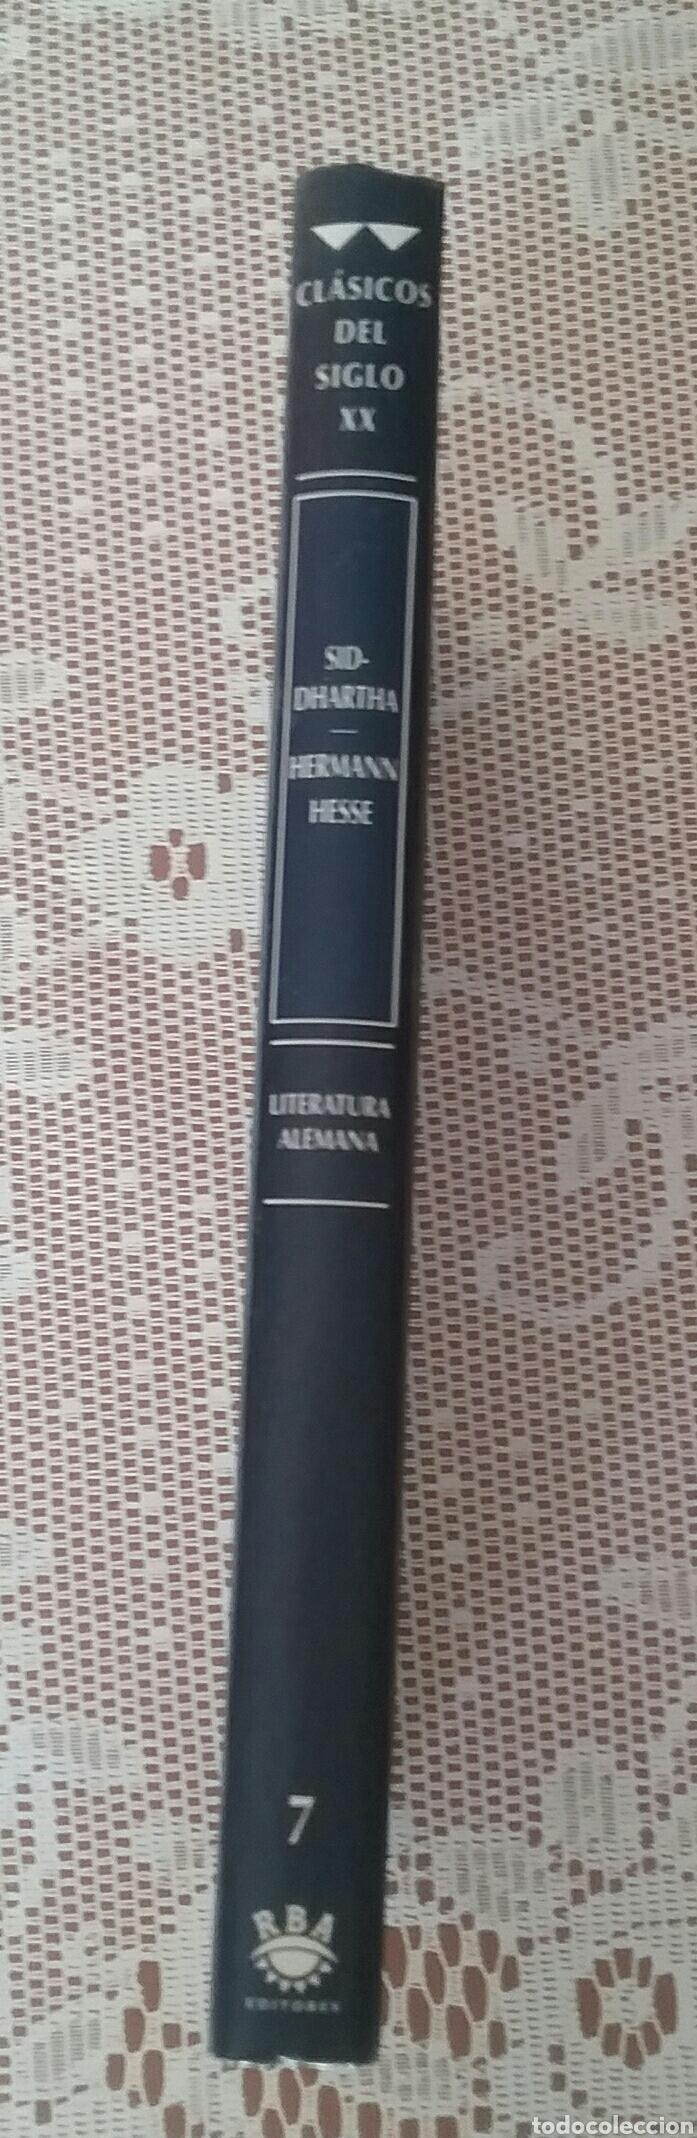 Libros de segunda mano: SIDDHARTA.HERMANN HESSE.CLASICOS DEL SIGLO XX. - Foto 3 - 194250143